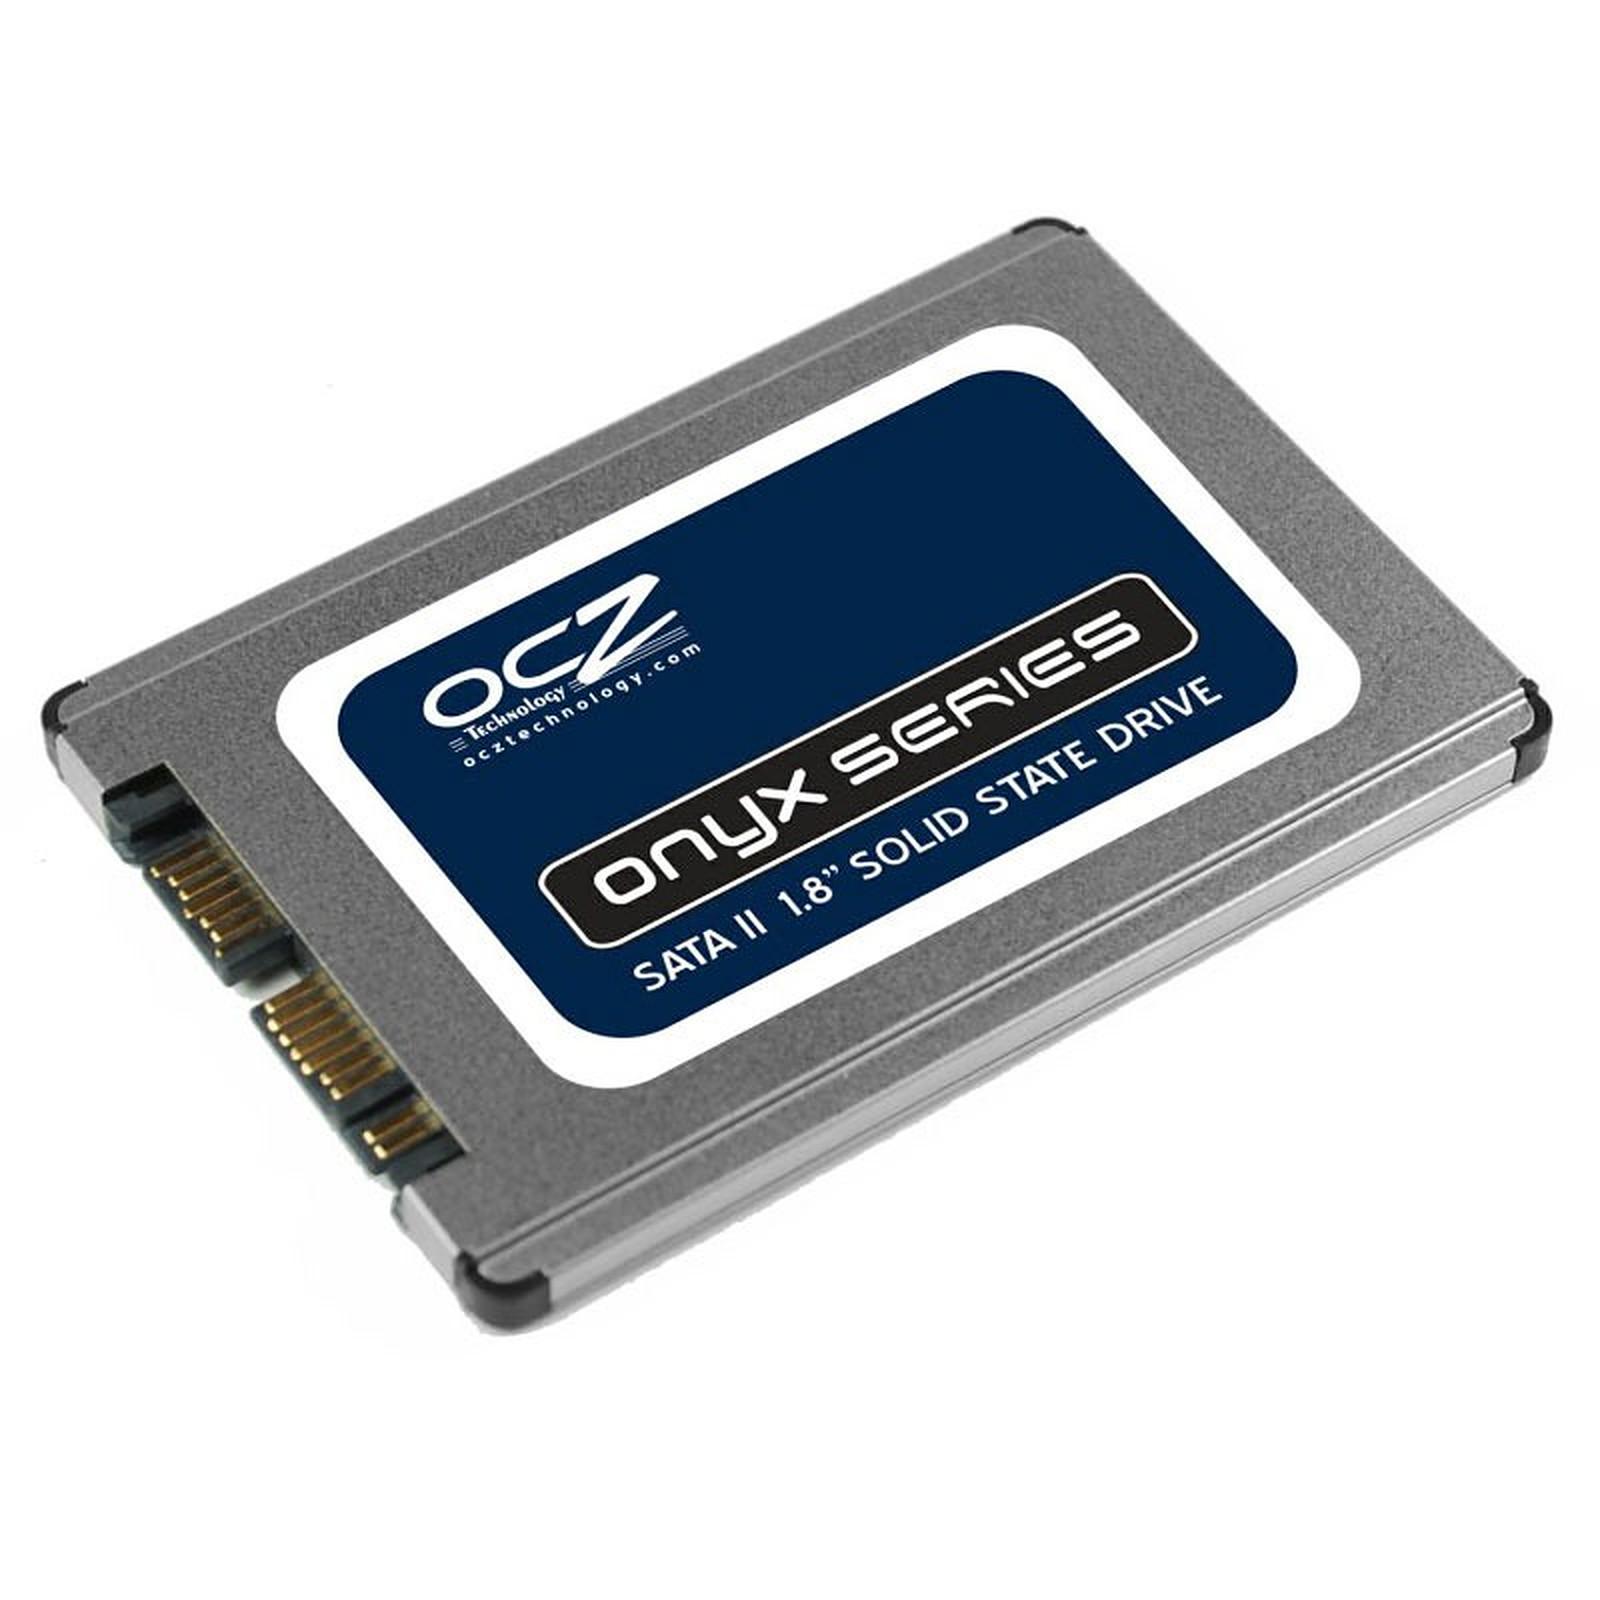 "OCZ Onyx Series 1.8"" 32 GB"